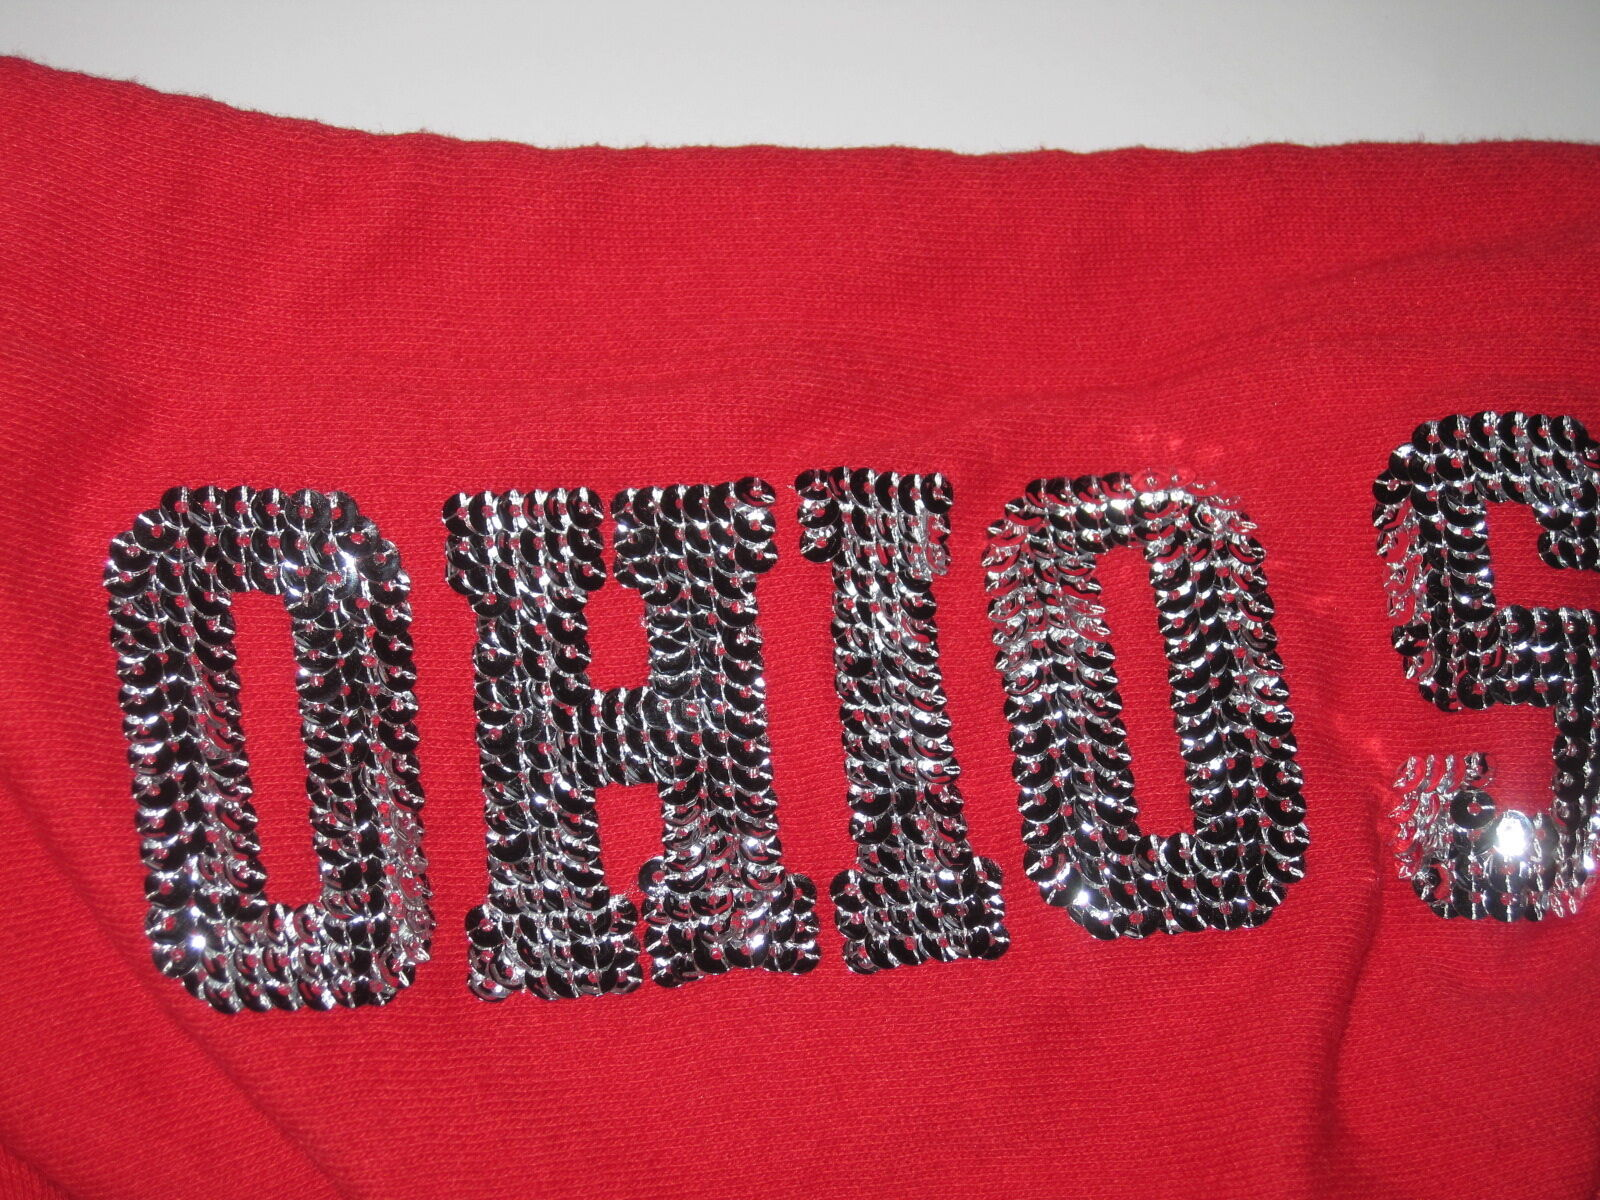 NWT VICTORIA'S SECRET PINK OHIO OHIO OHIO STATE BLING RED SEQUIN ZIP UP HOODIE SWEATSHIRT 1f5120